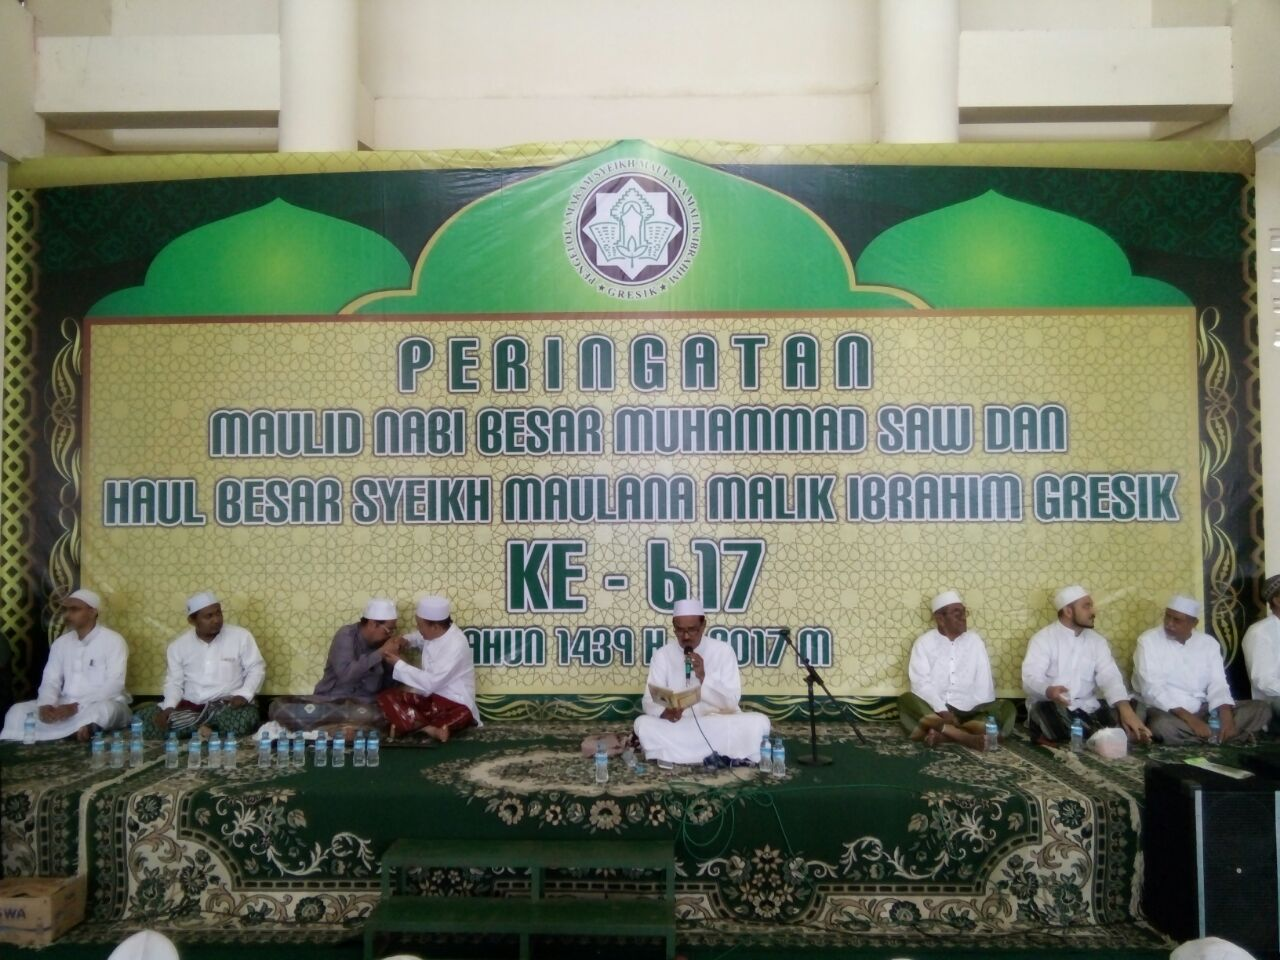 Maulid Nabi Serta Haul Syeikh Maulana Malik Ibrahim Digelar Bersamaan